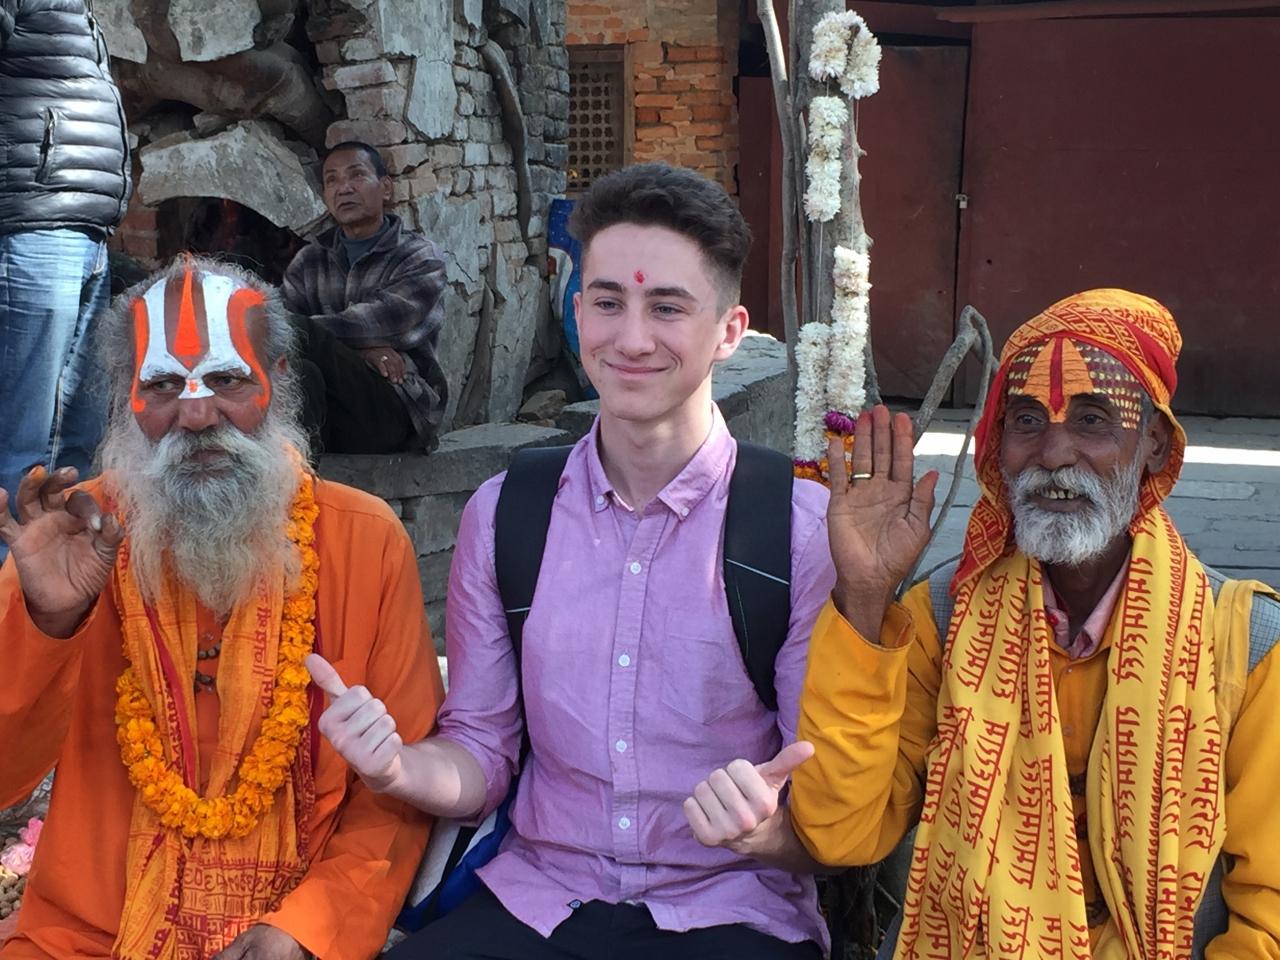 Cross cultural experience in Kathmandu